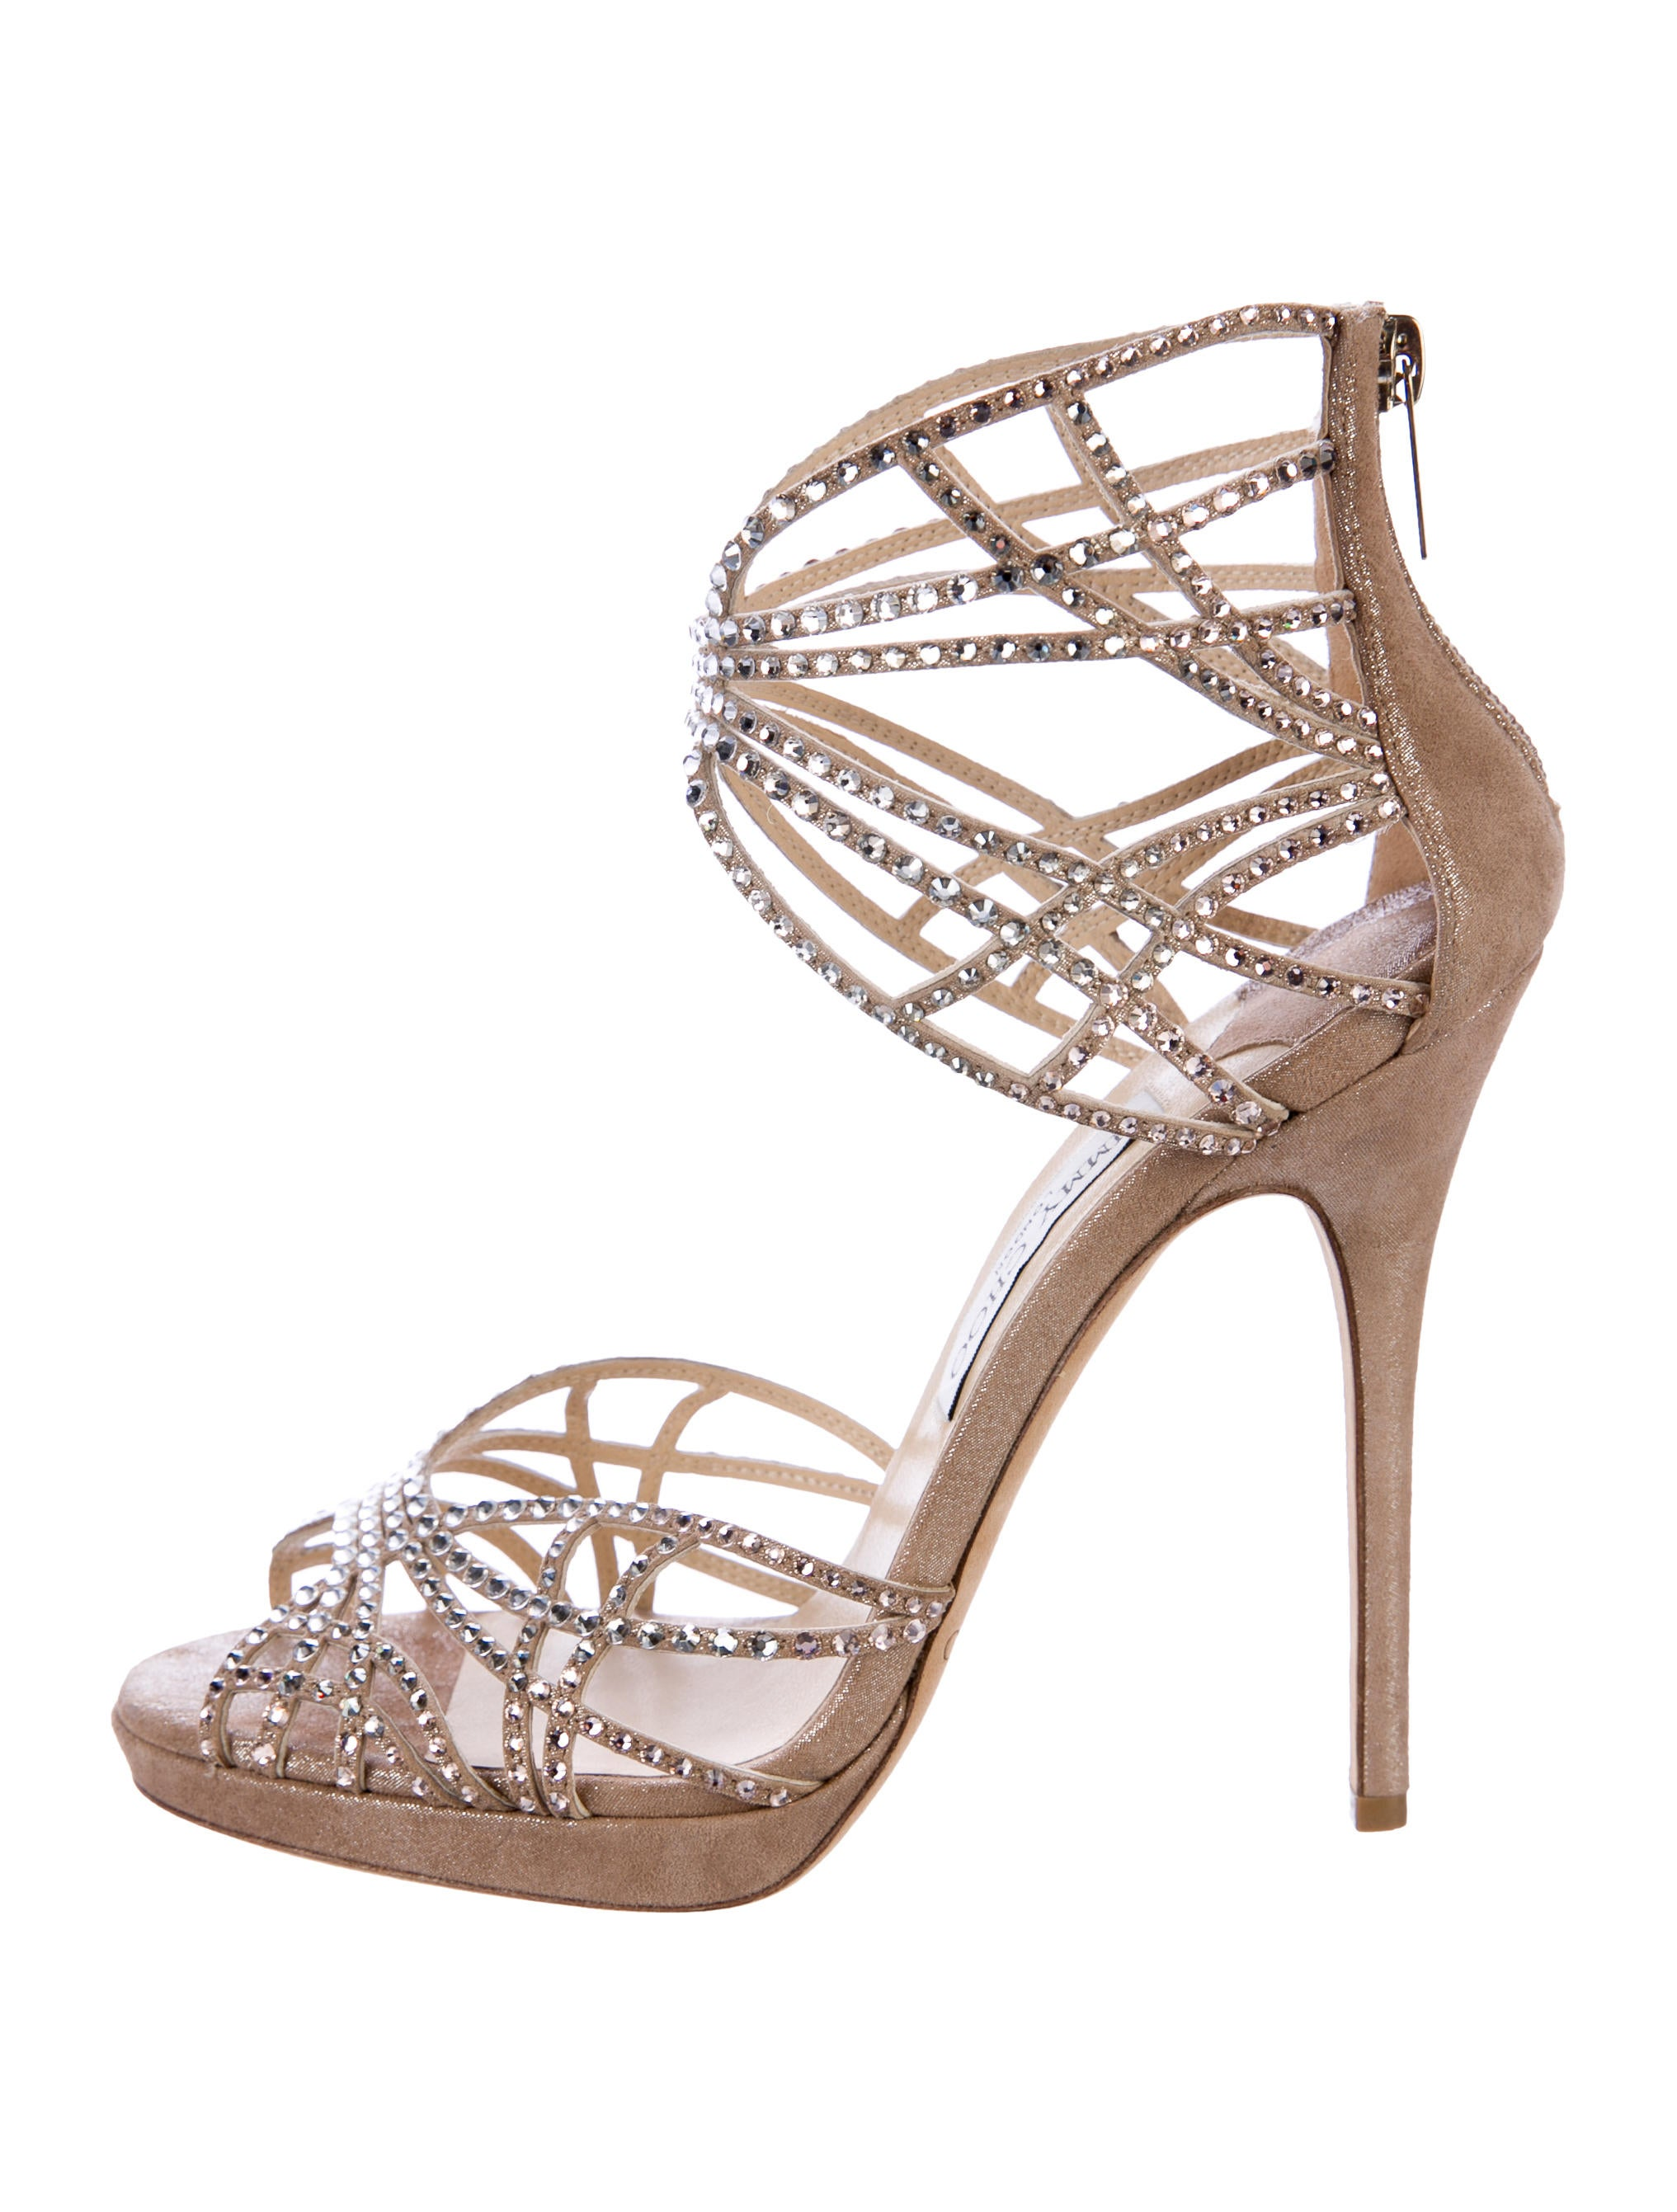 9920246e3636f3 Jimmy Choo Diva Crystal-Embellished Sandals - Shoes - JIM78635